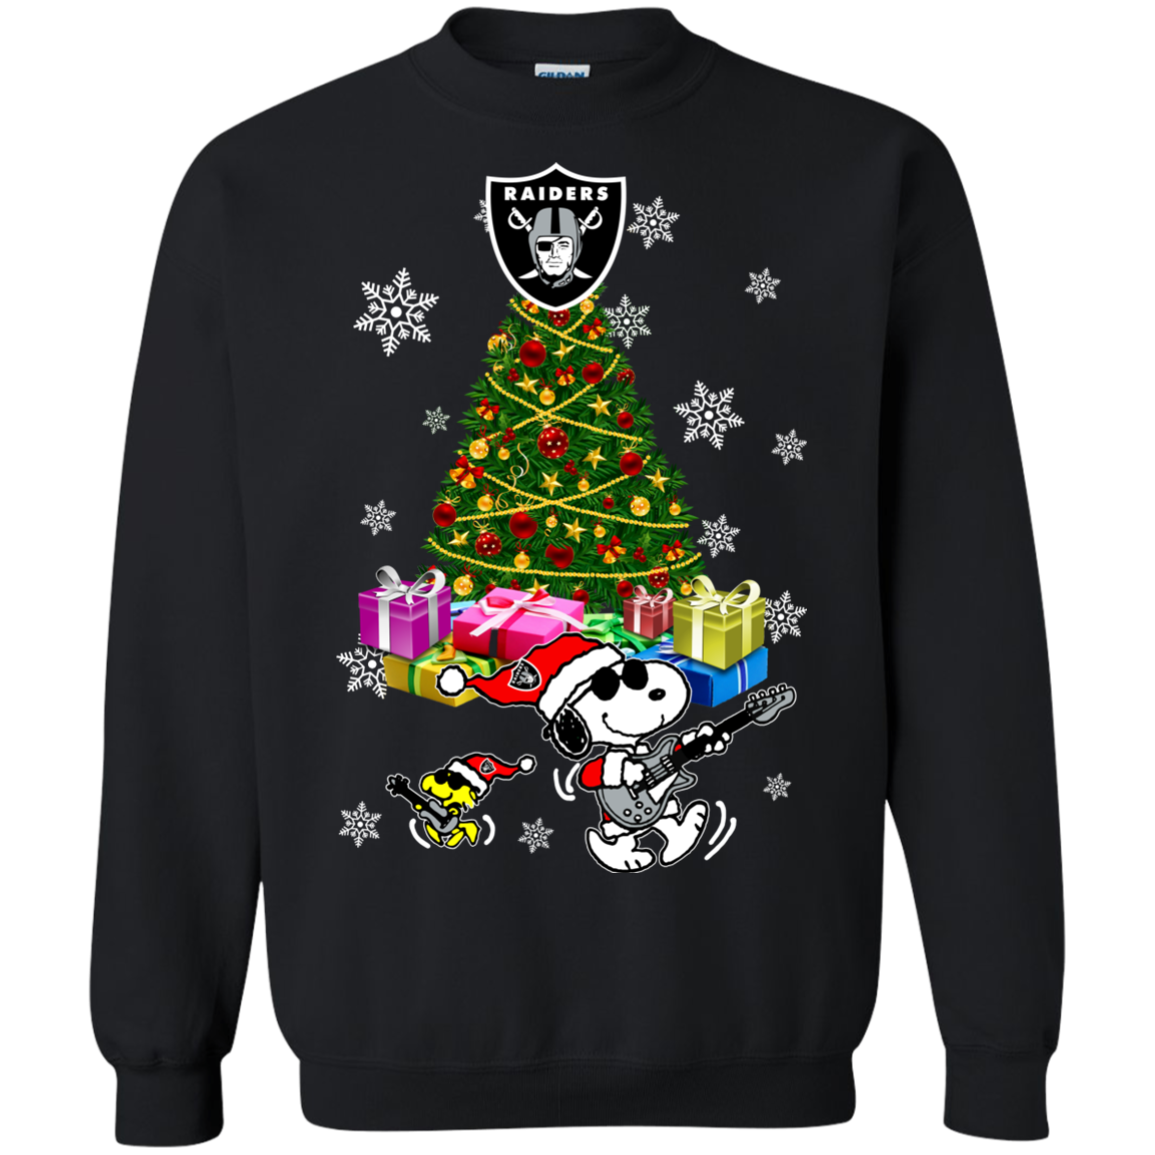 6bb82fcb5ec Oakland Raiders Ugly Christmas Sweaters Merry Christmas Snoopy Hoodies  Sweatshirts